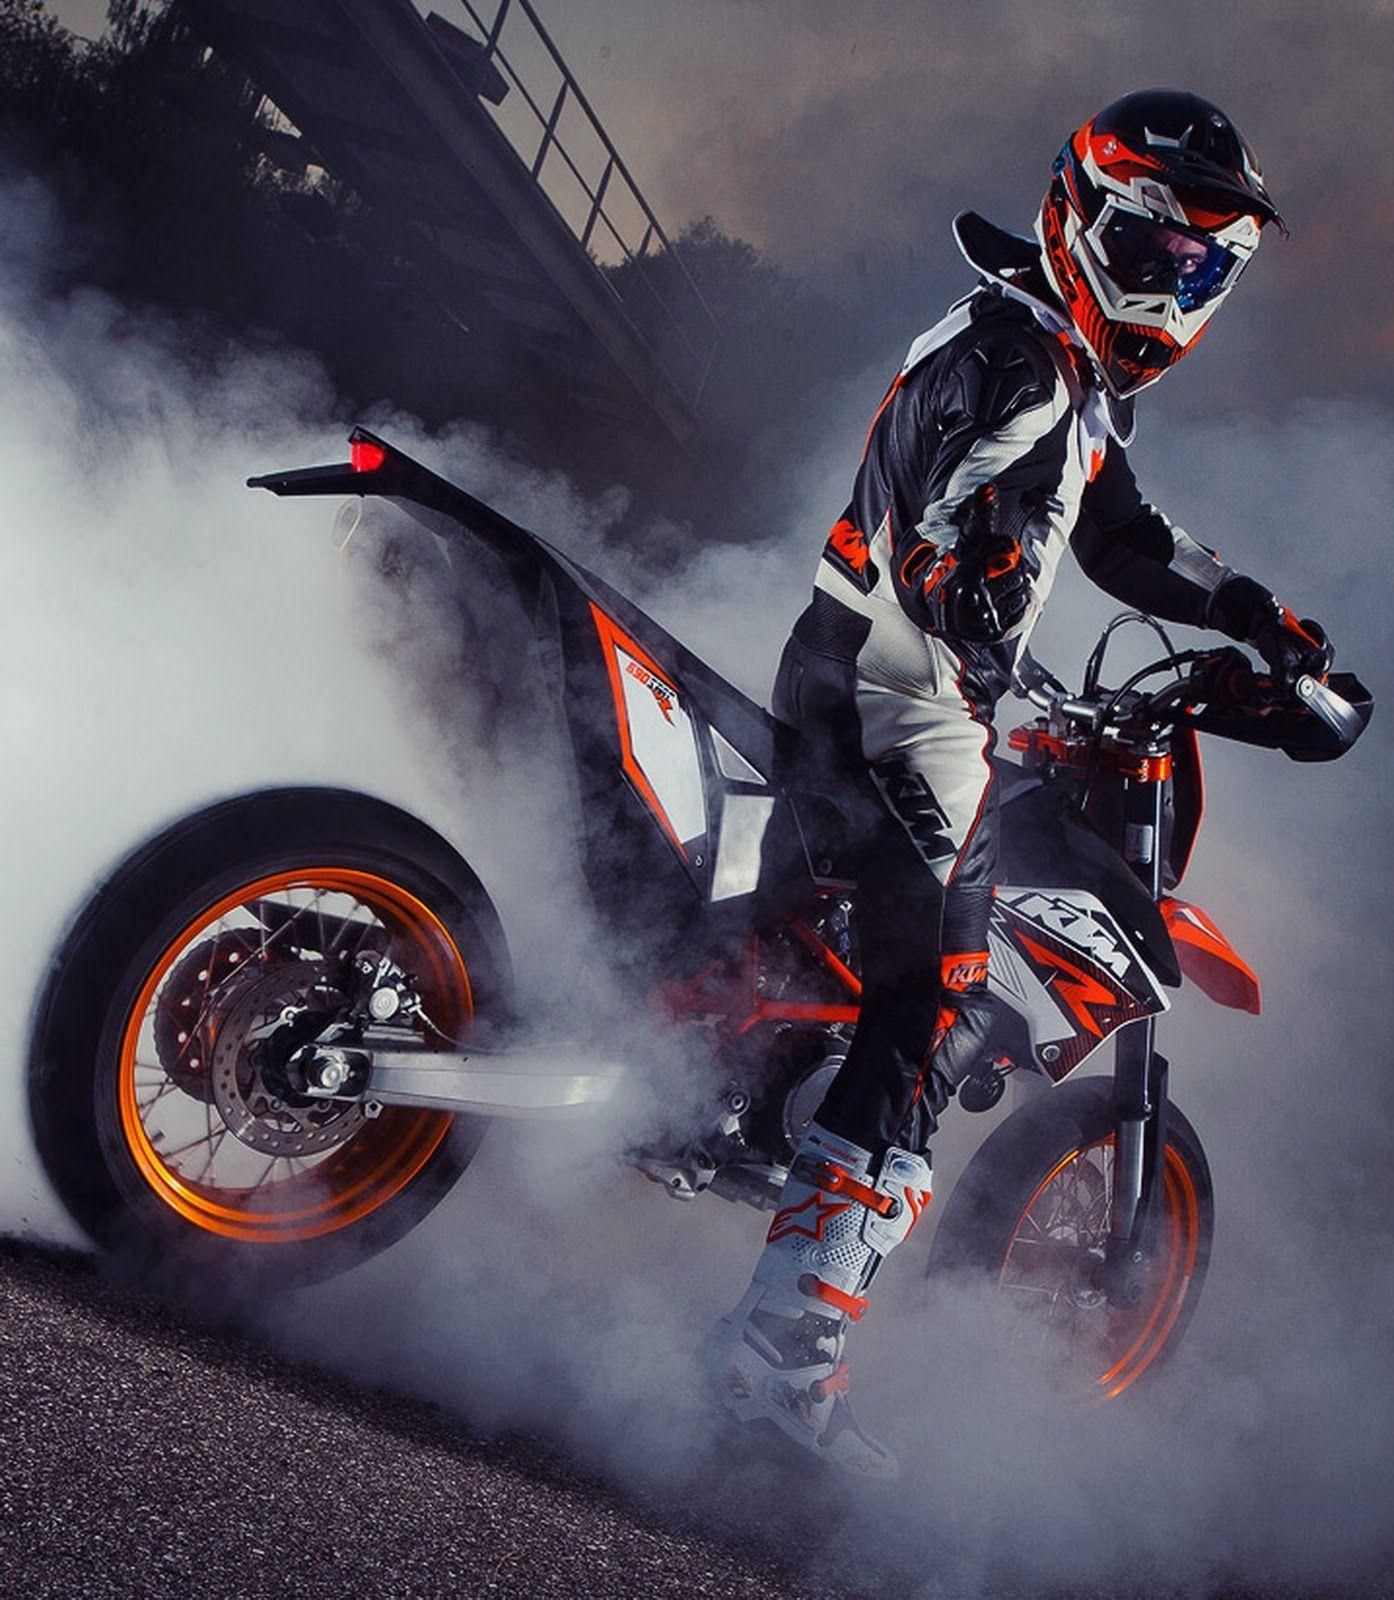 Wawa Wallpaper Wallpaper Motocross 4k Celular Custom Bike Sepeda Foto Jurnalistik